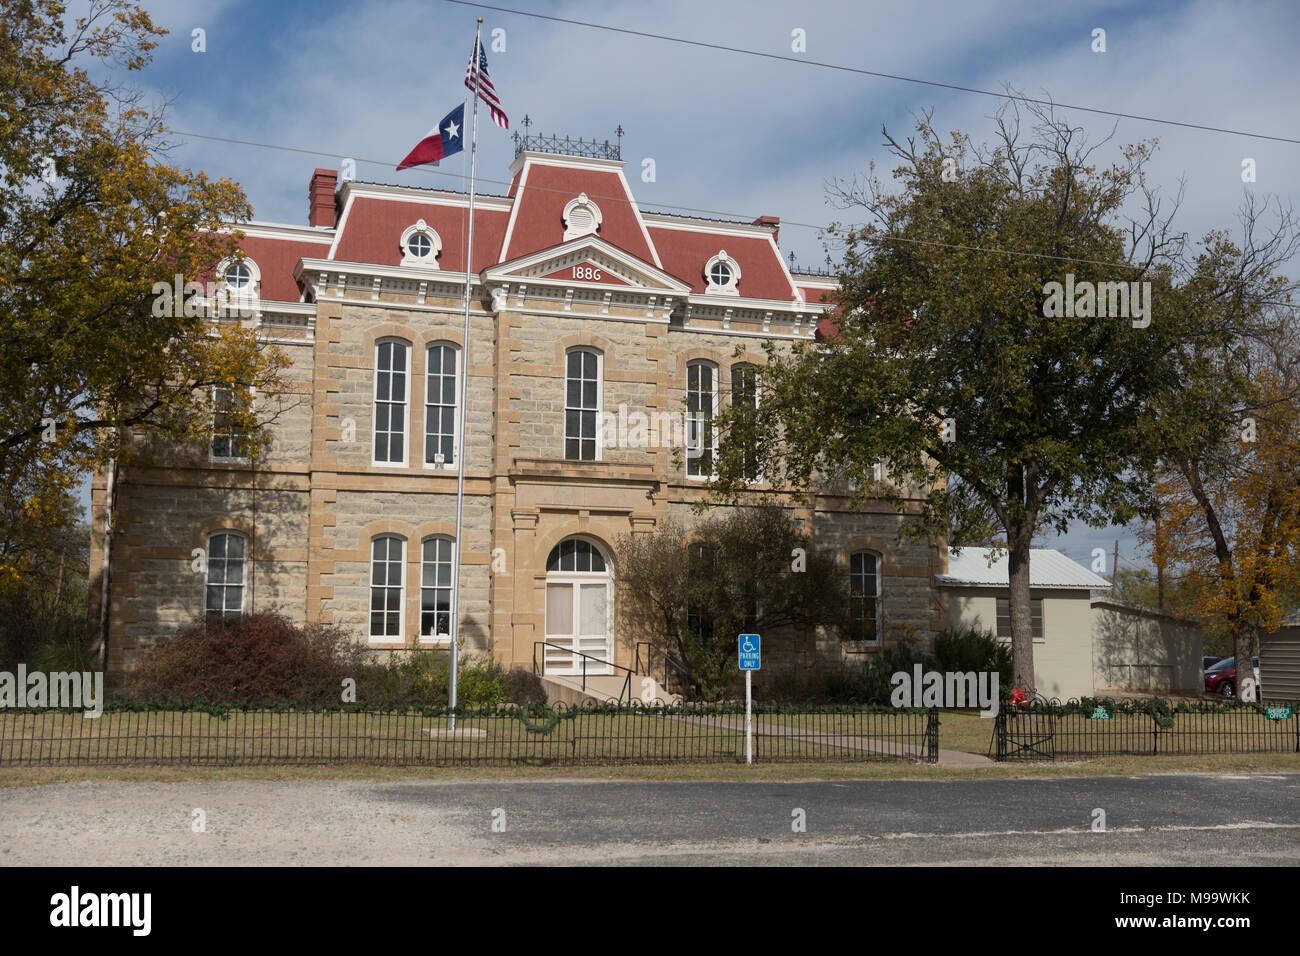 Concho histórico County Courthouse en Paint Rock, Texas Imagen De Stock